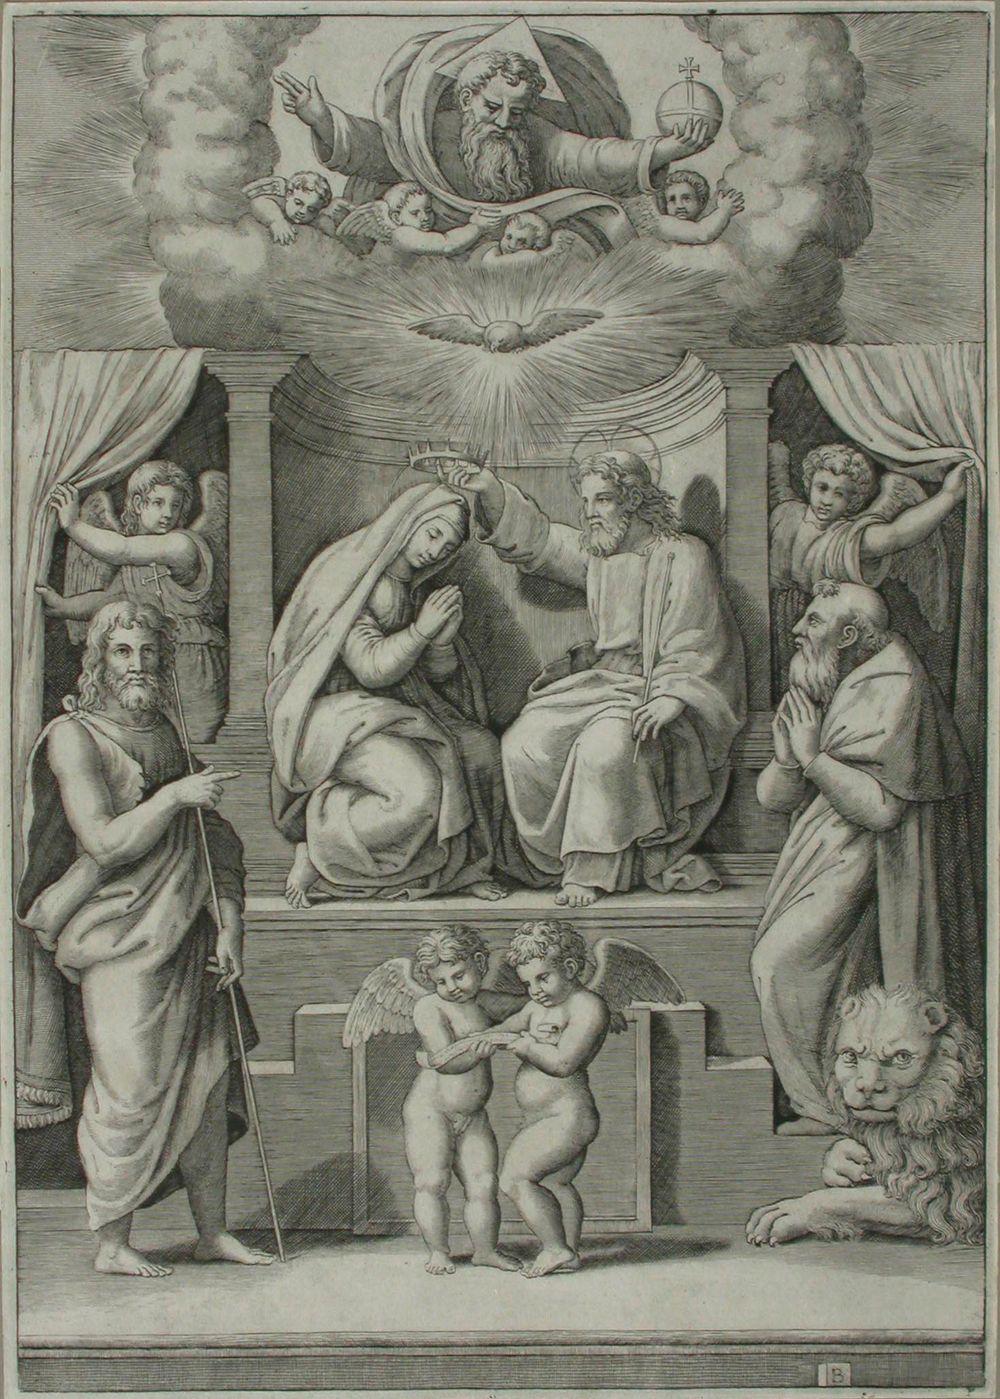 Marian kruunaus ; B -mestari (monogrammi kuutiossa)